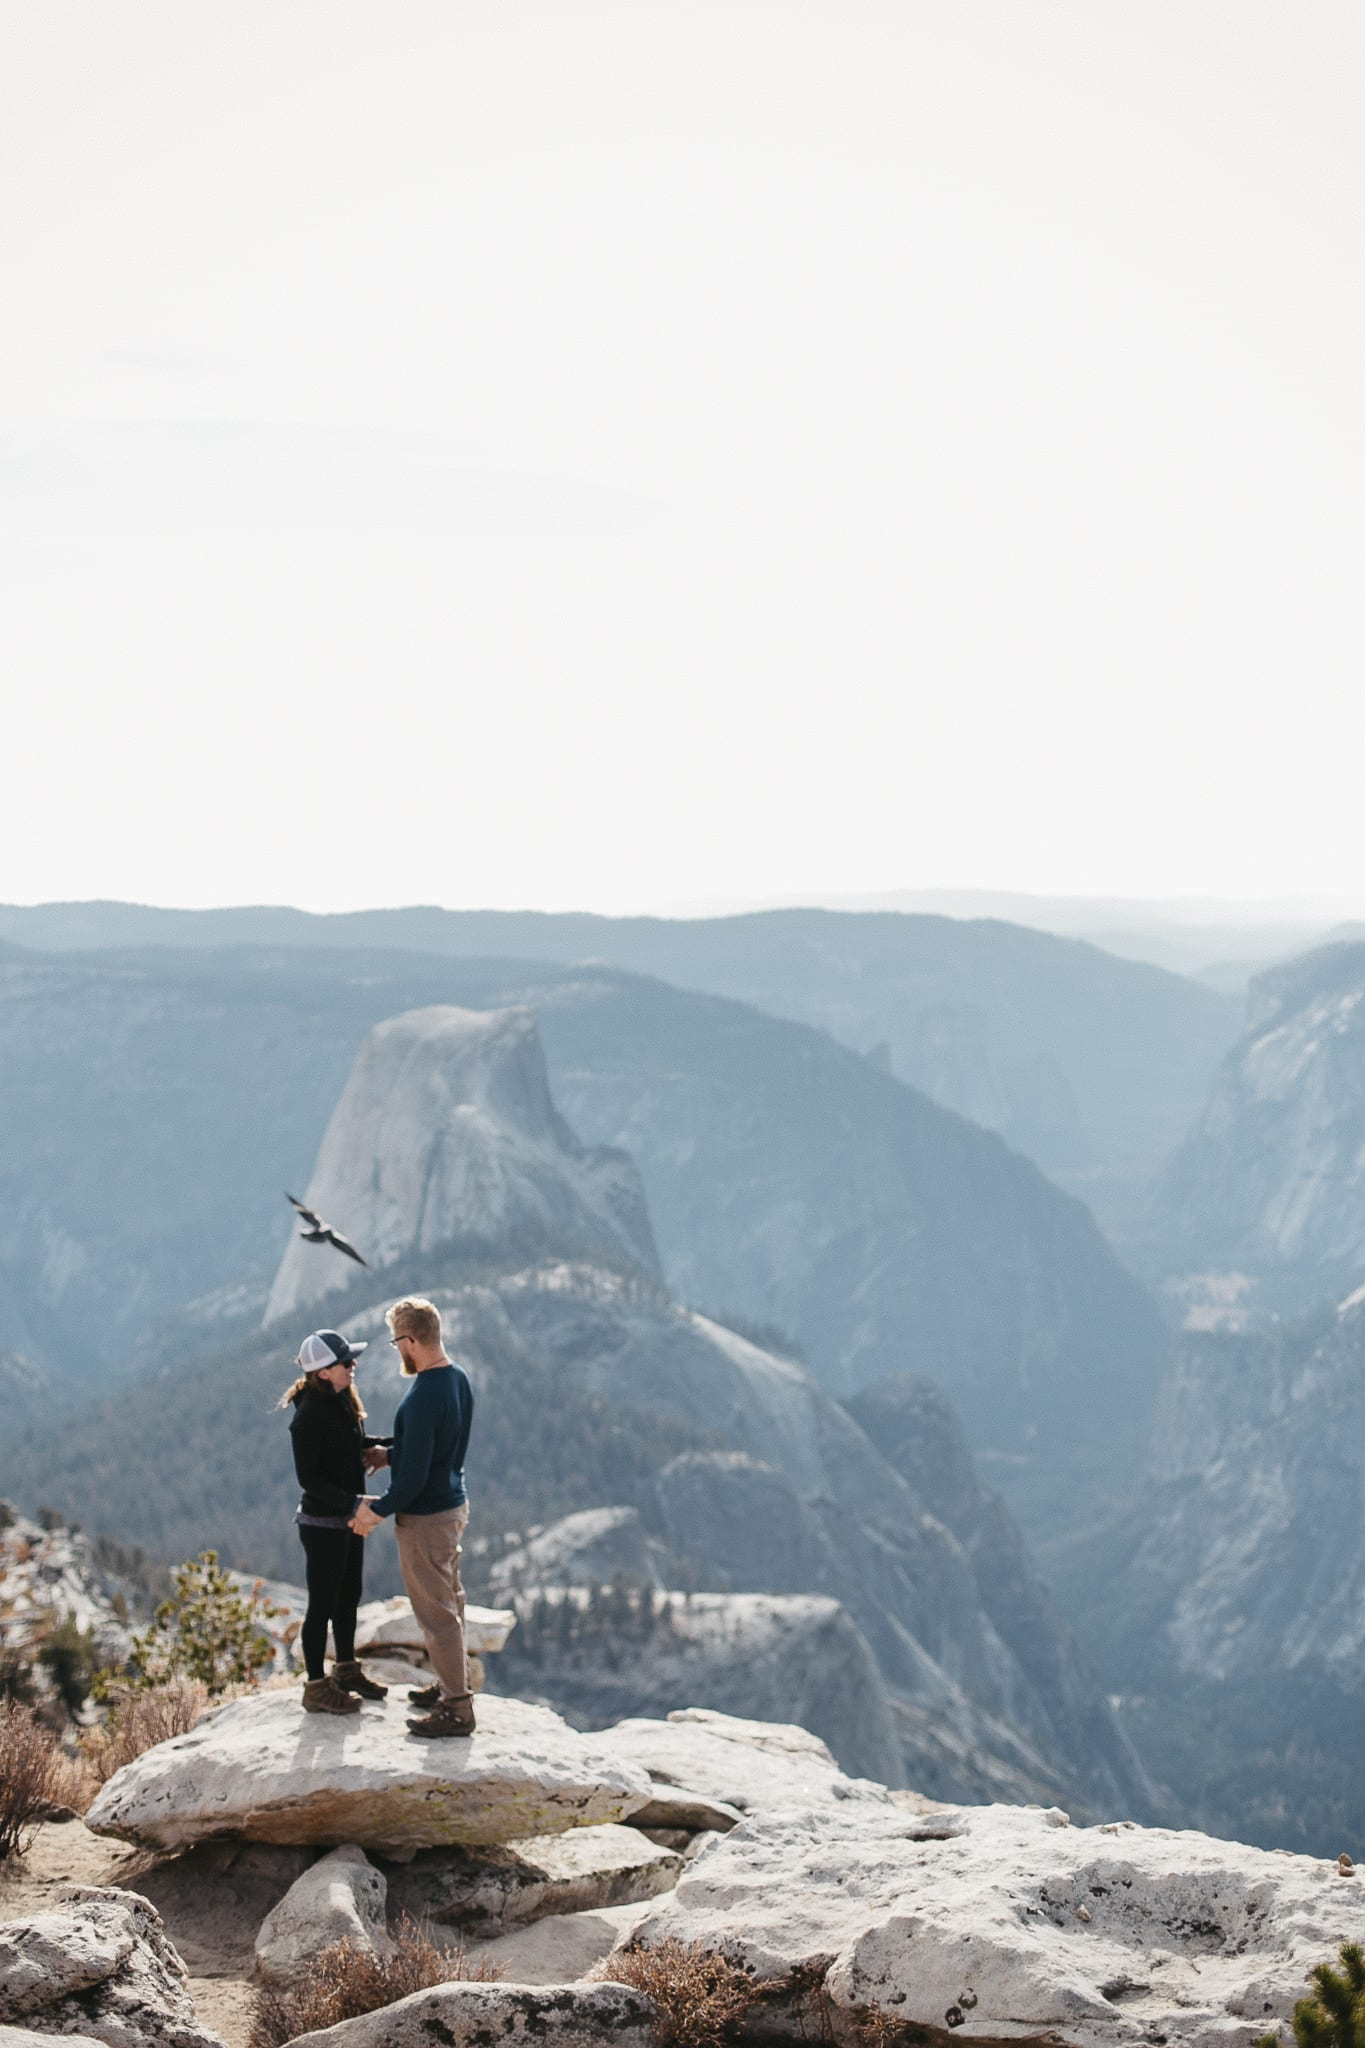 clouds-rest-yosemite-california-engagement-lifestyle-adventure-photographer-21